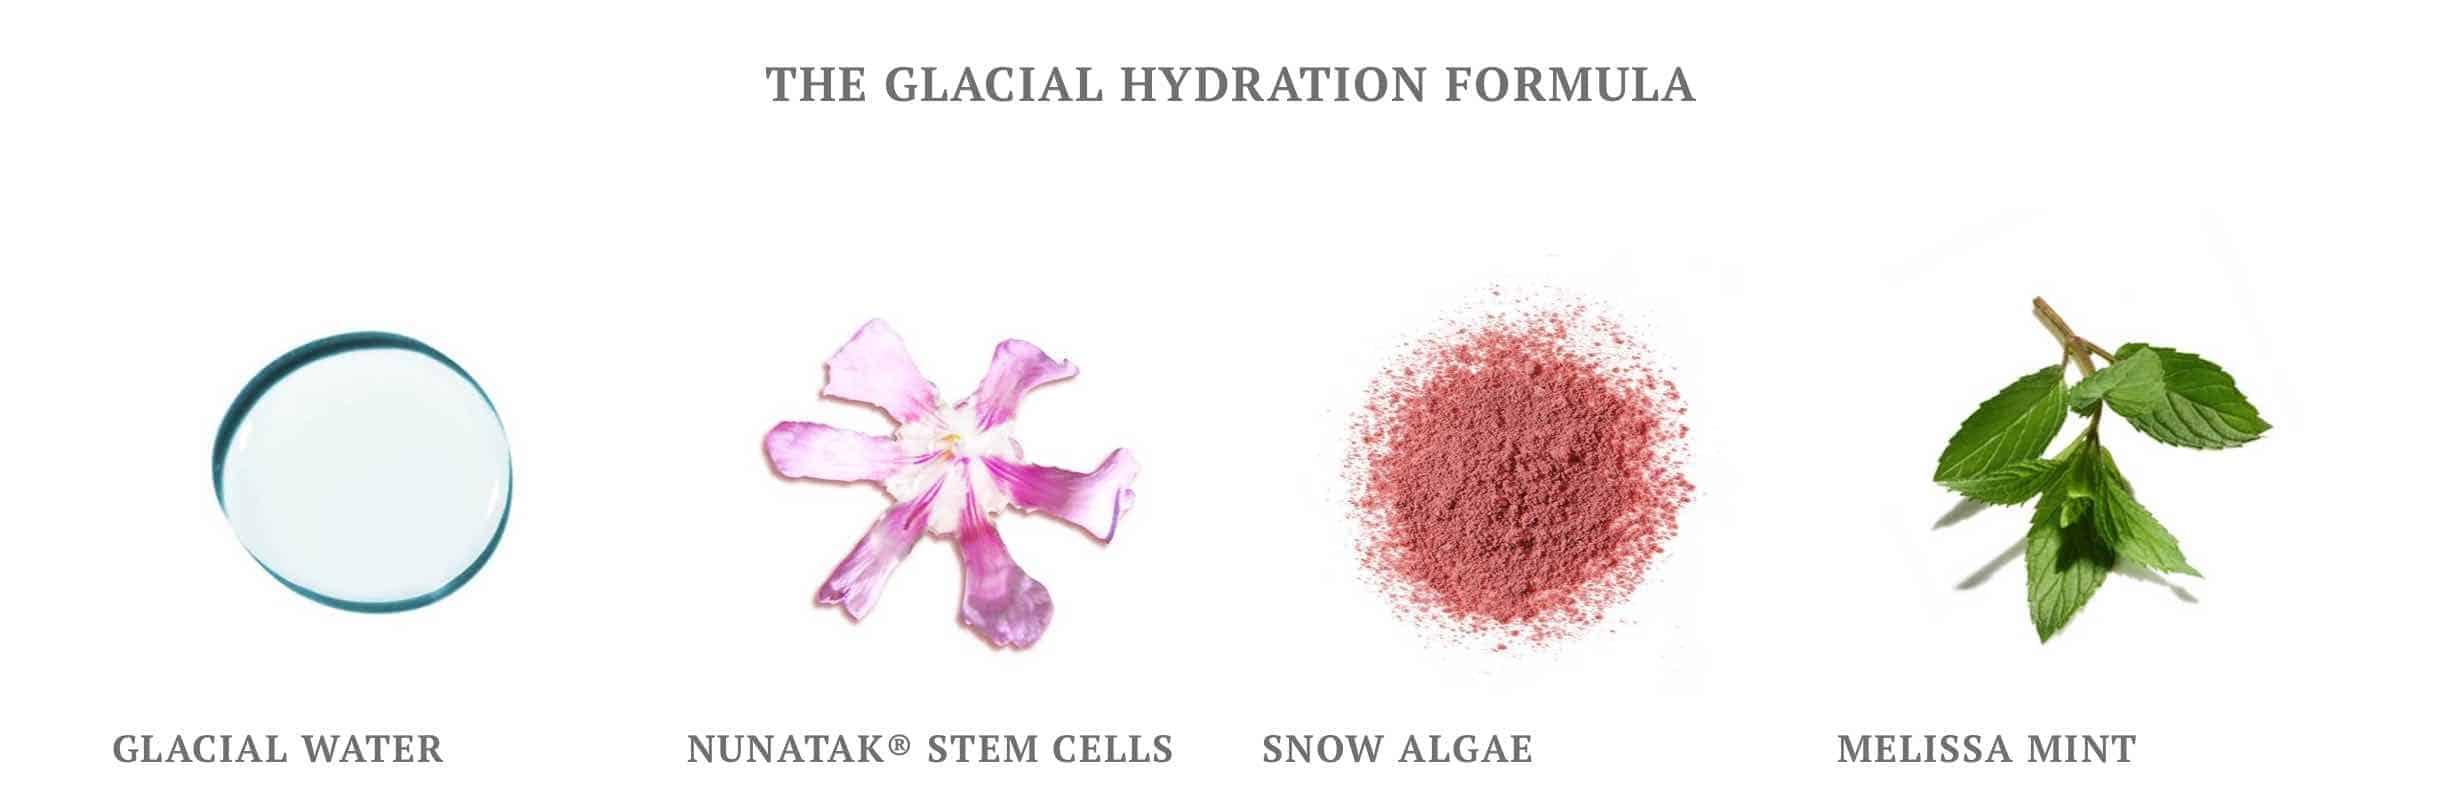 Jacqueline Piotaz Glacial Hydration Skincare